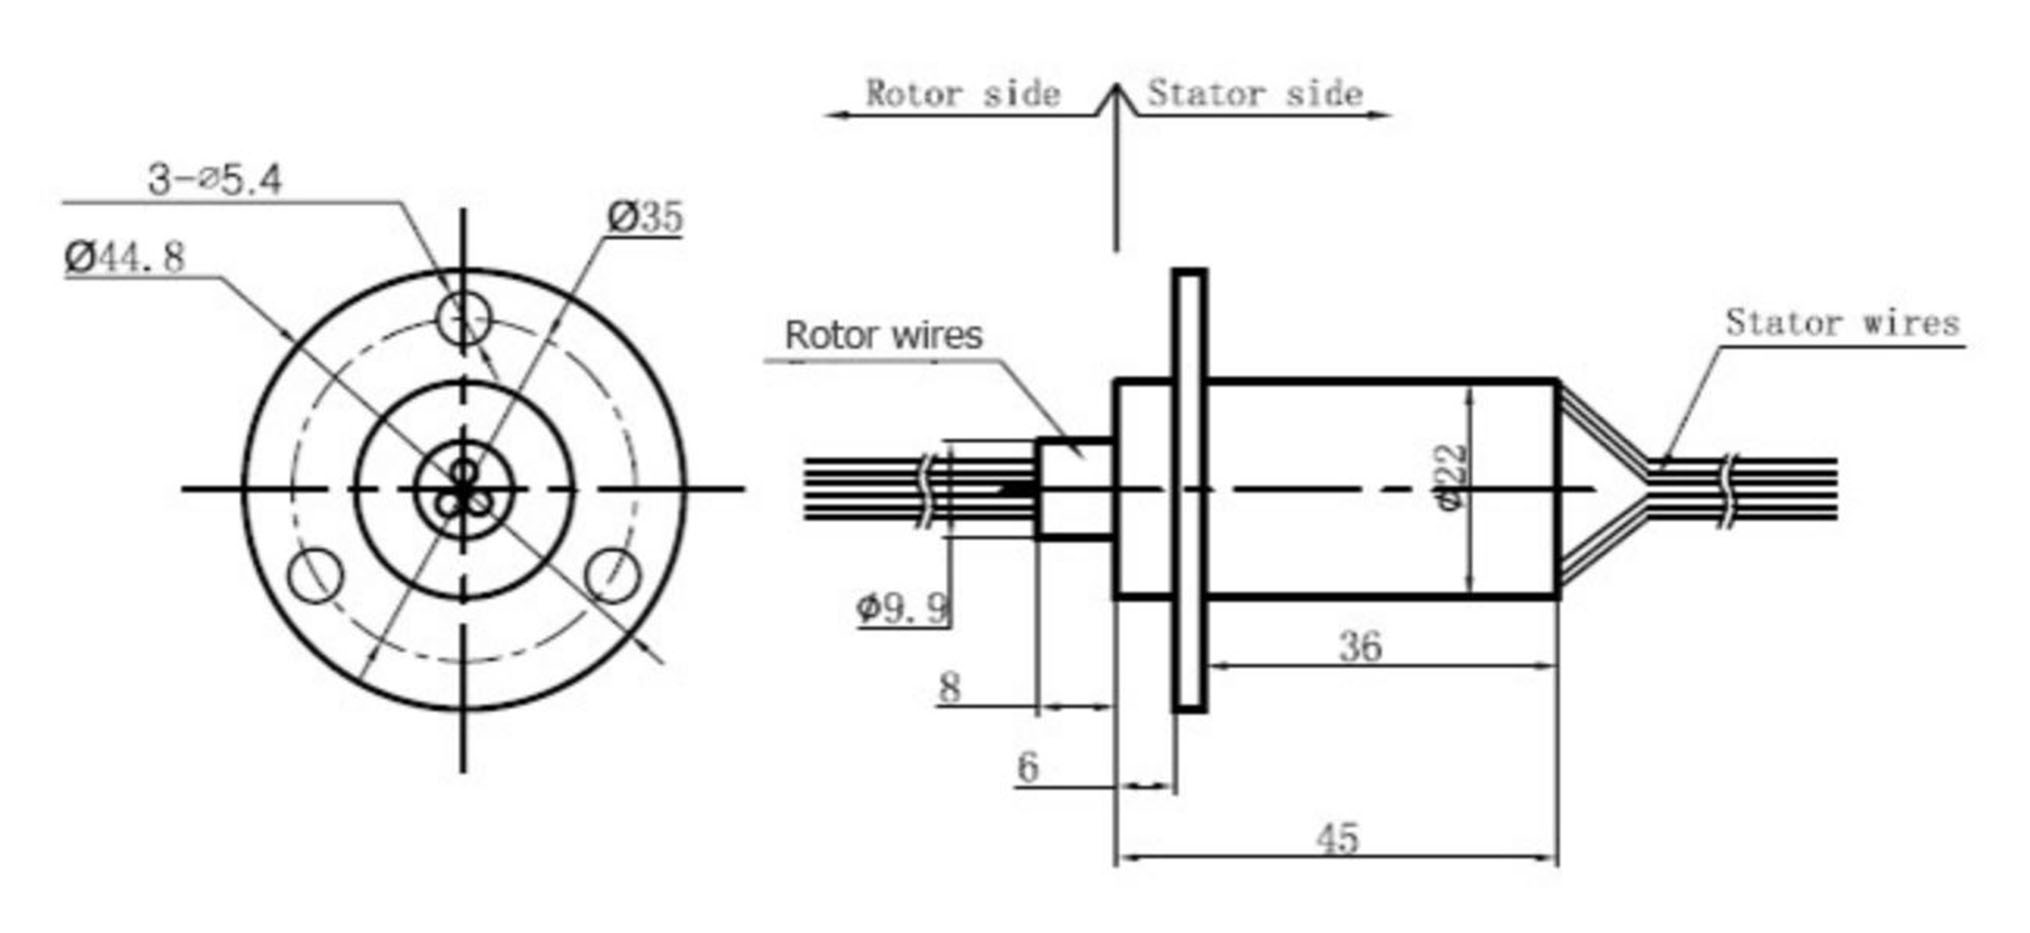 moflon-slip-rings-3x30a.jpg